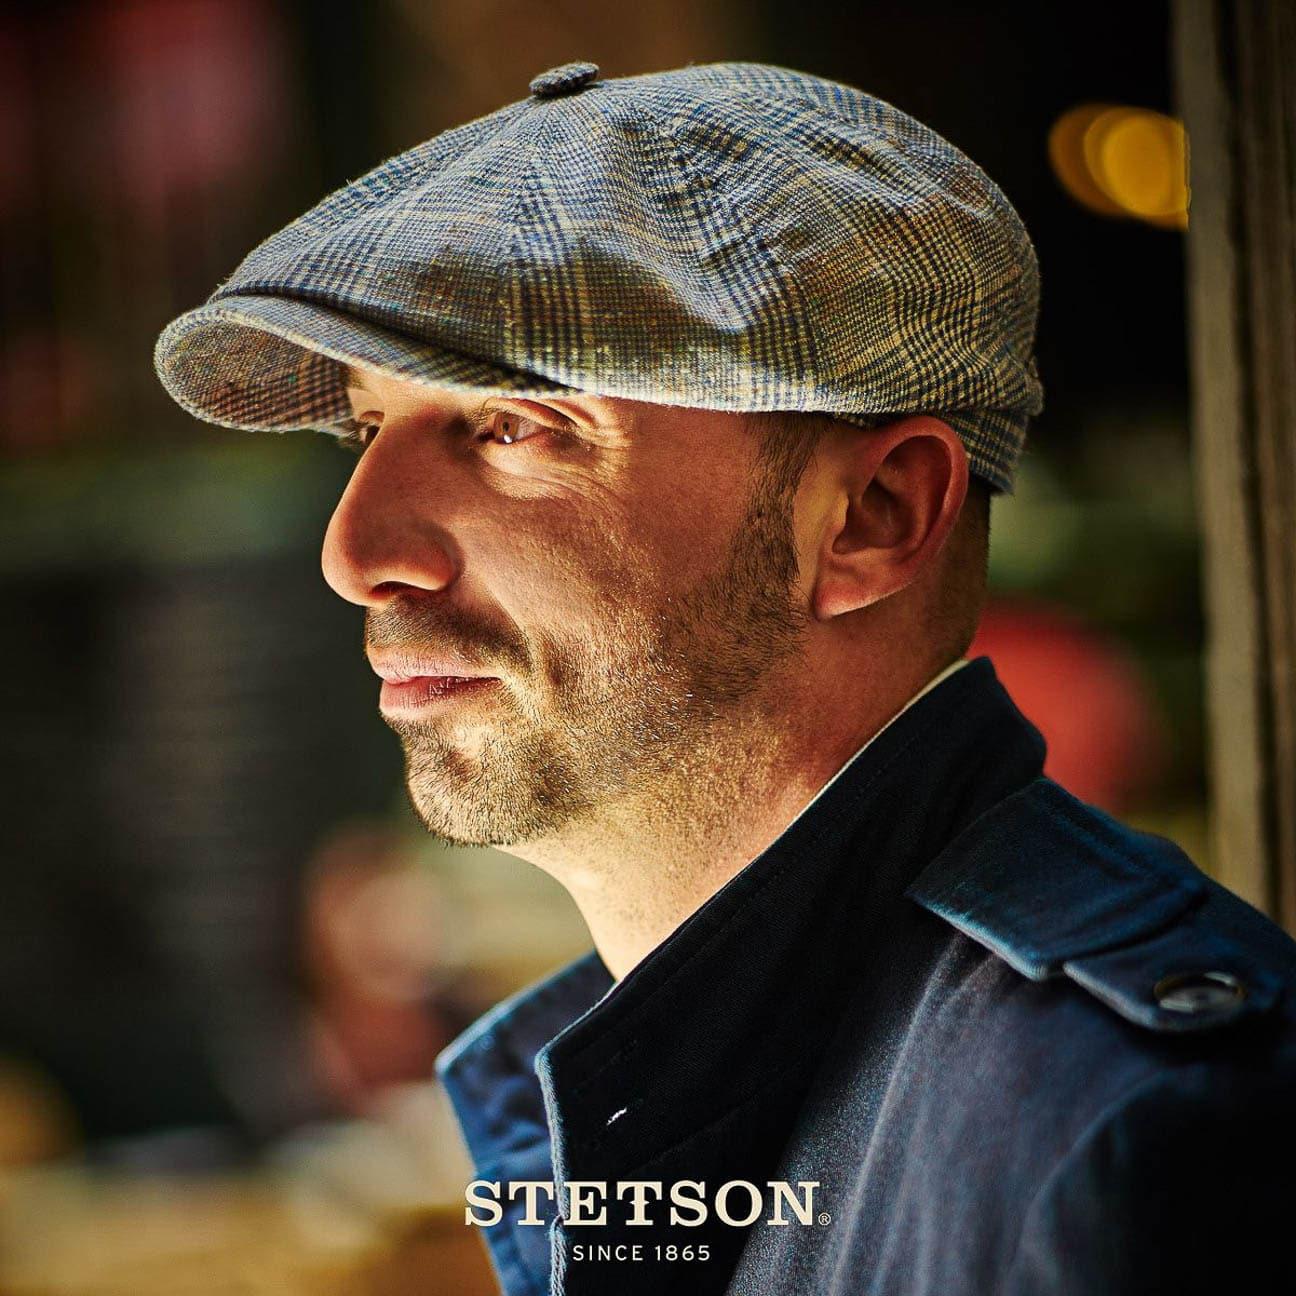 ... Hatteras Tropic Silk Flat Cap by Stetson 1 ... 23a7c137610